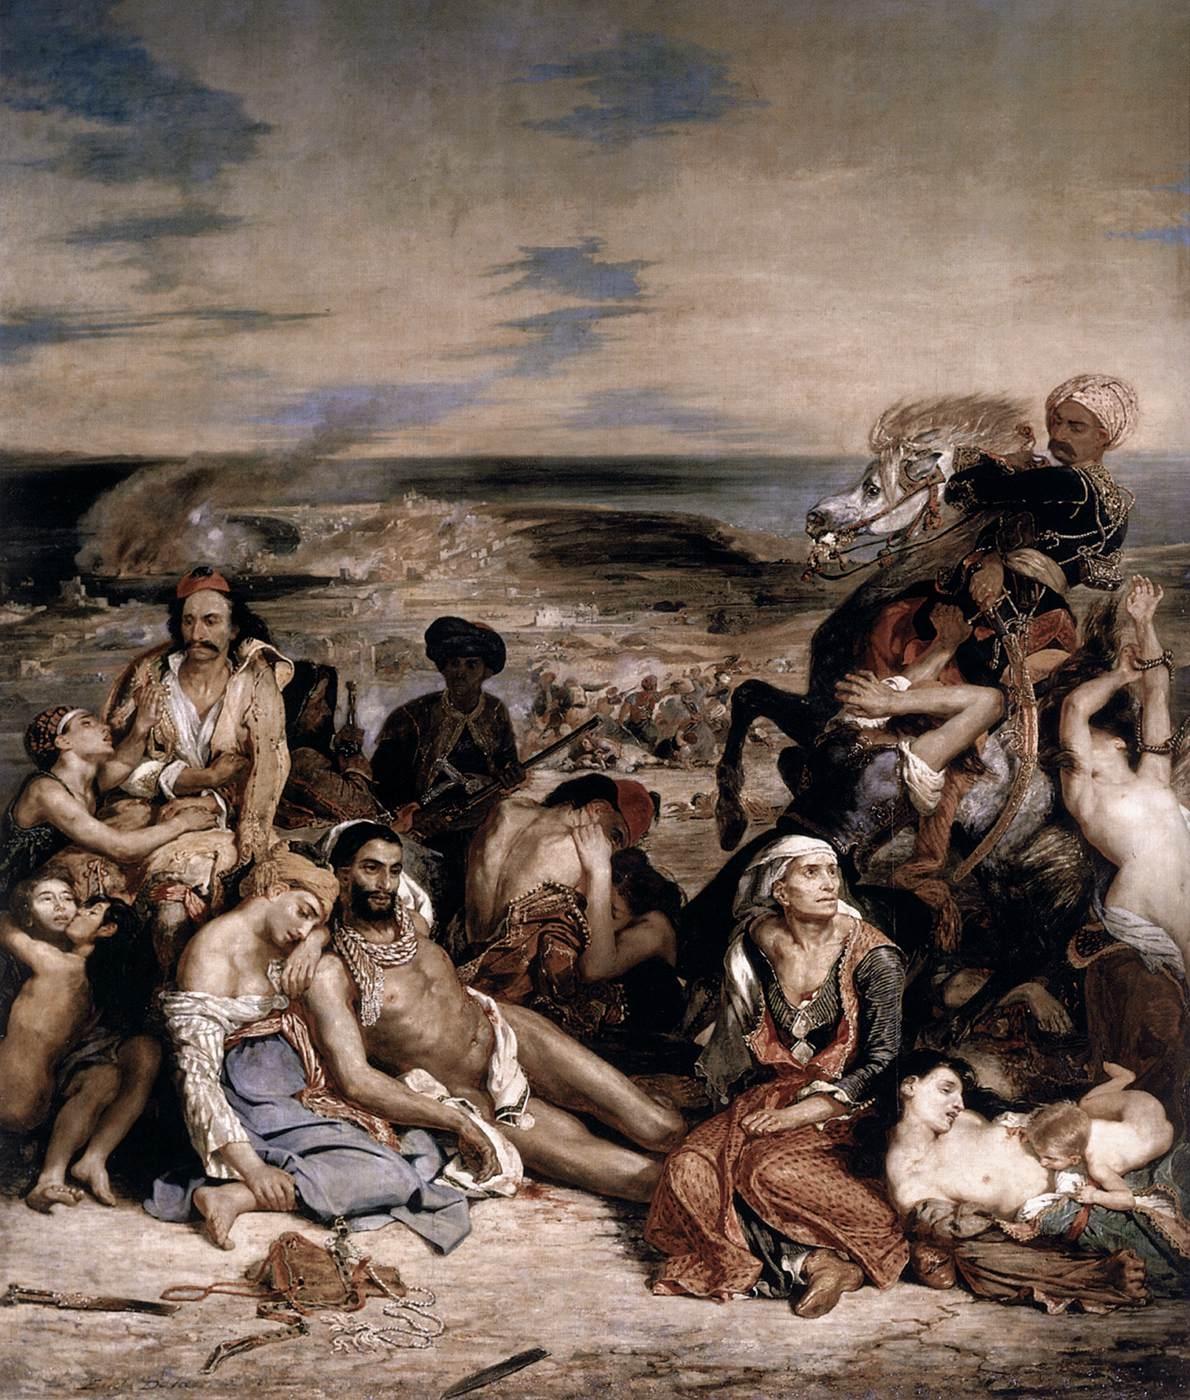 Eugène Delacroix Le Massacre de Scio